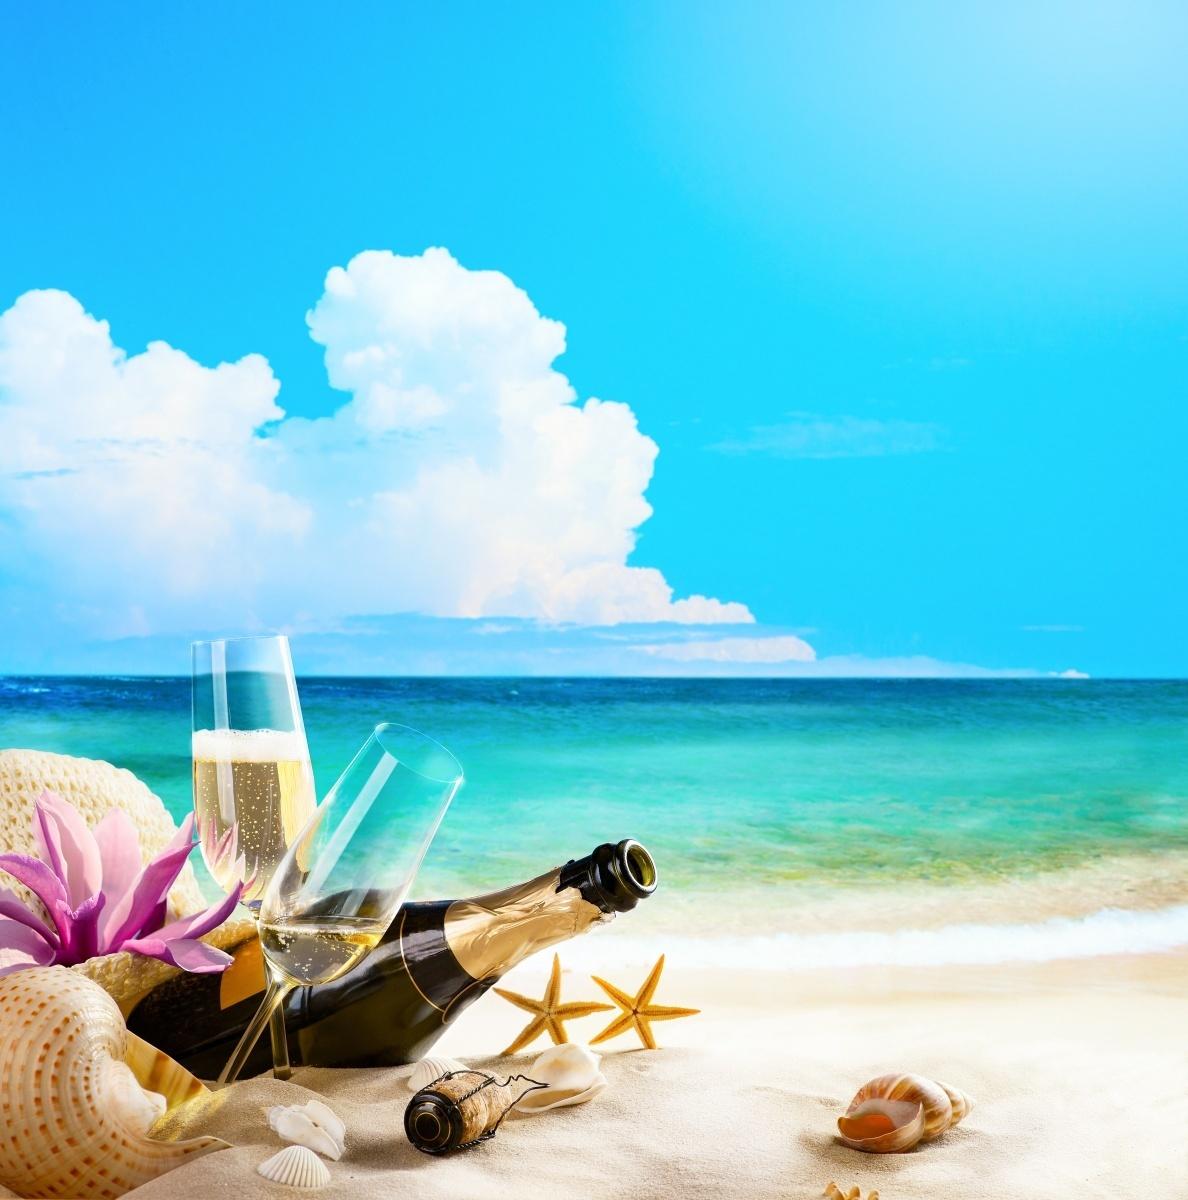 Шампан�кое на бе�ег� мо�я � champagne on the beach